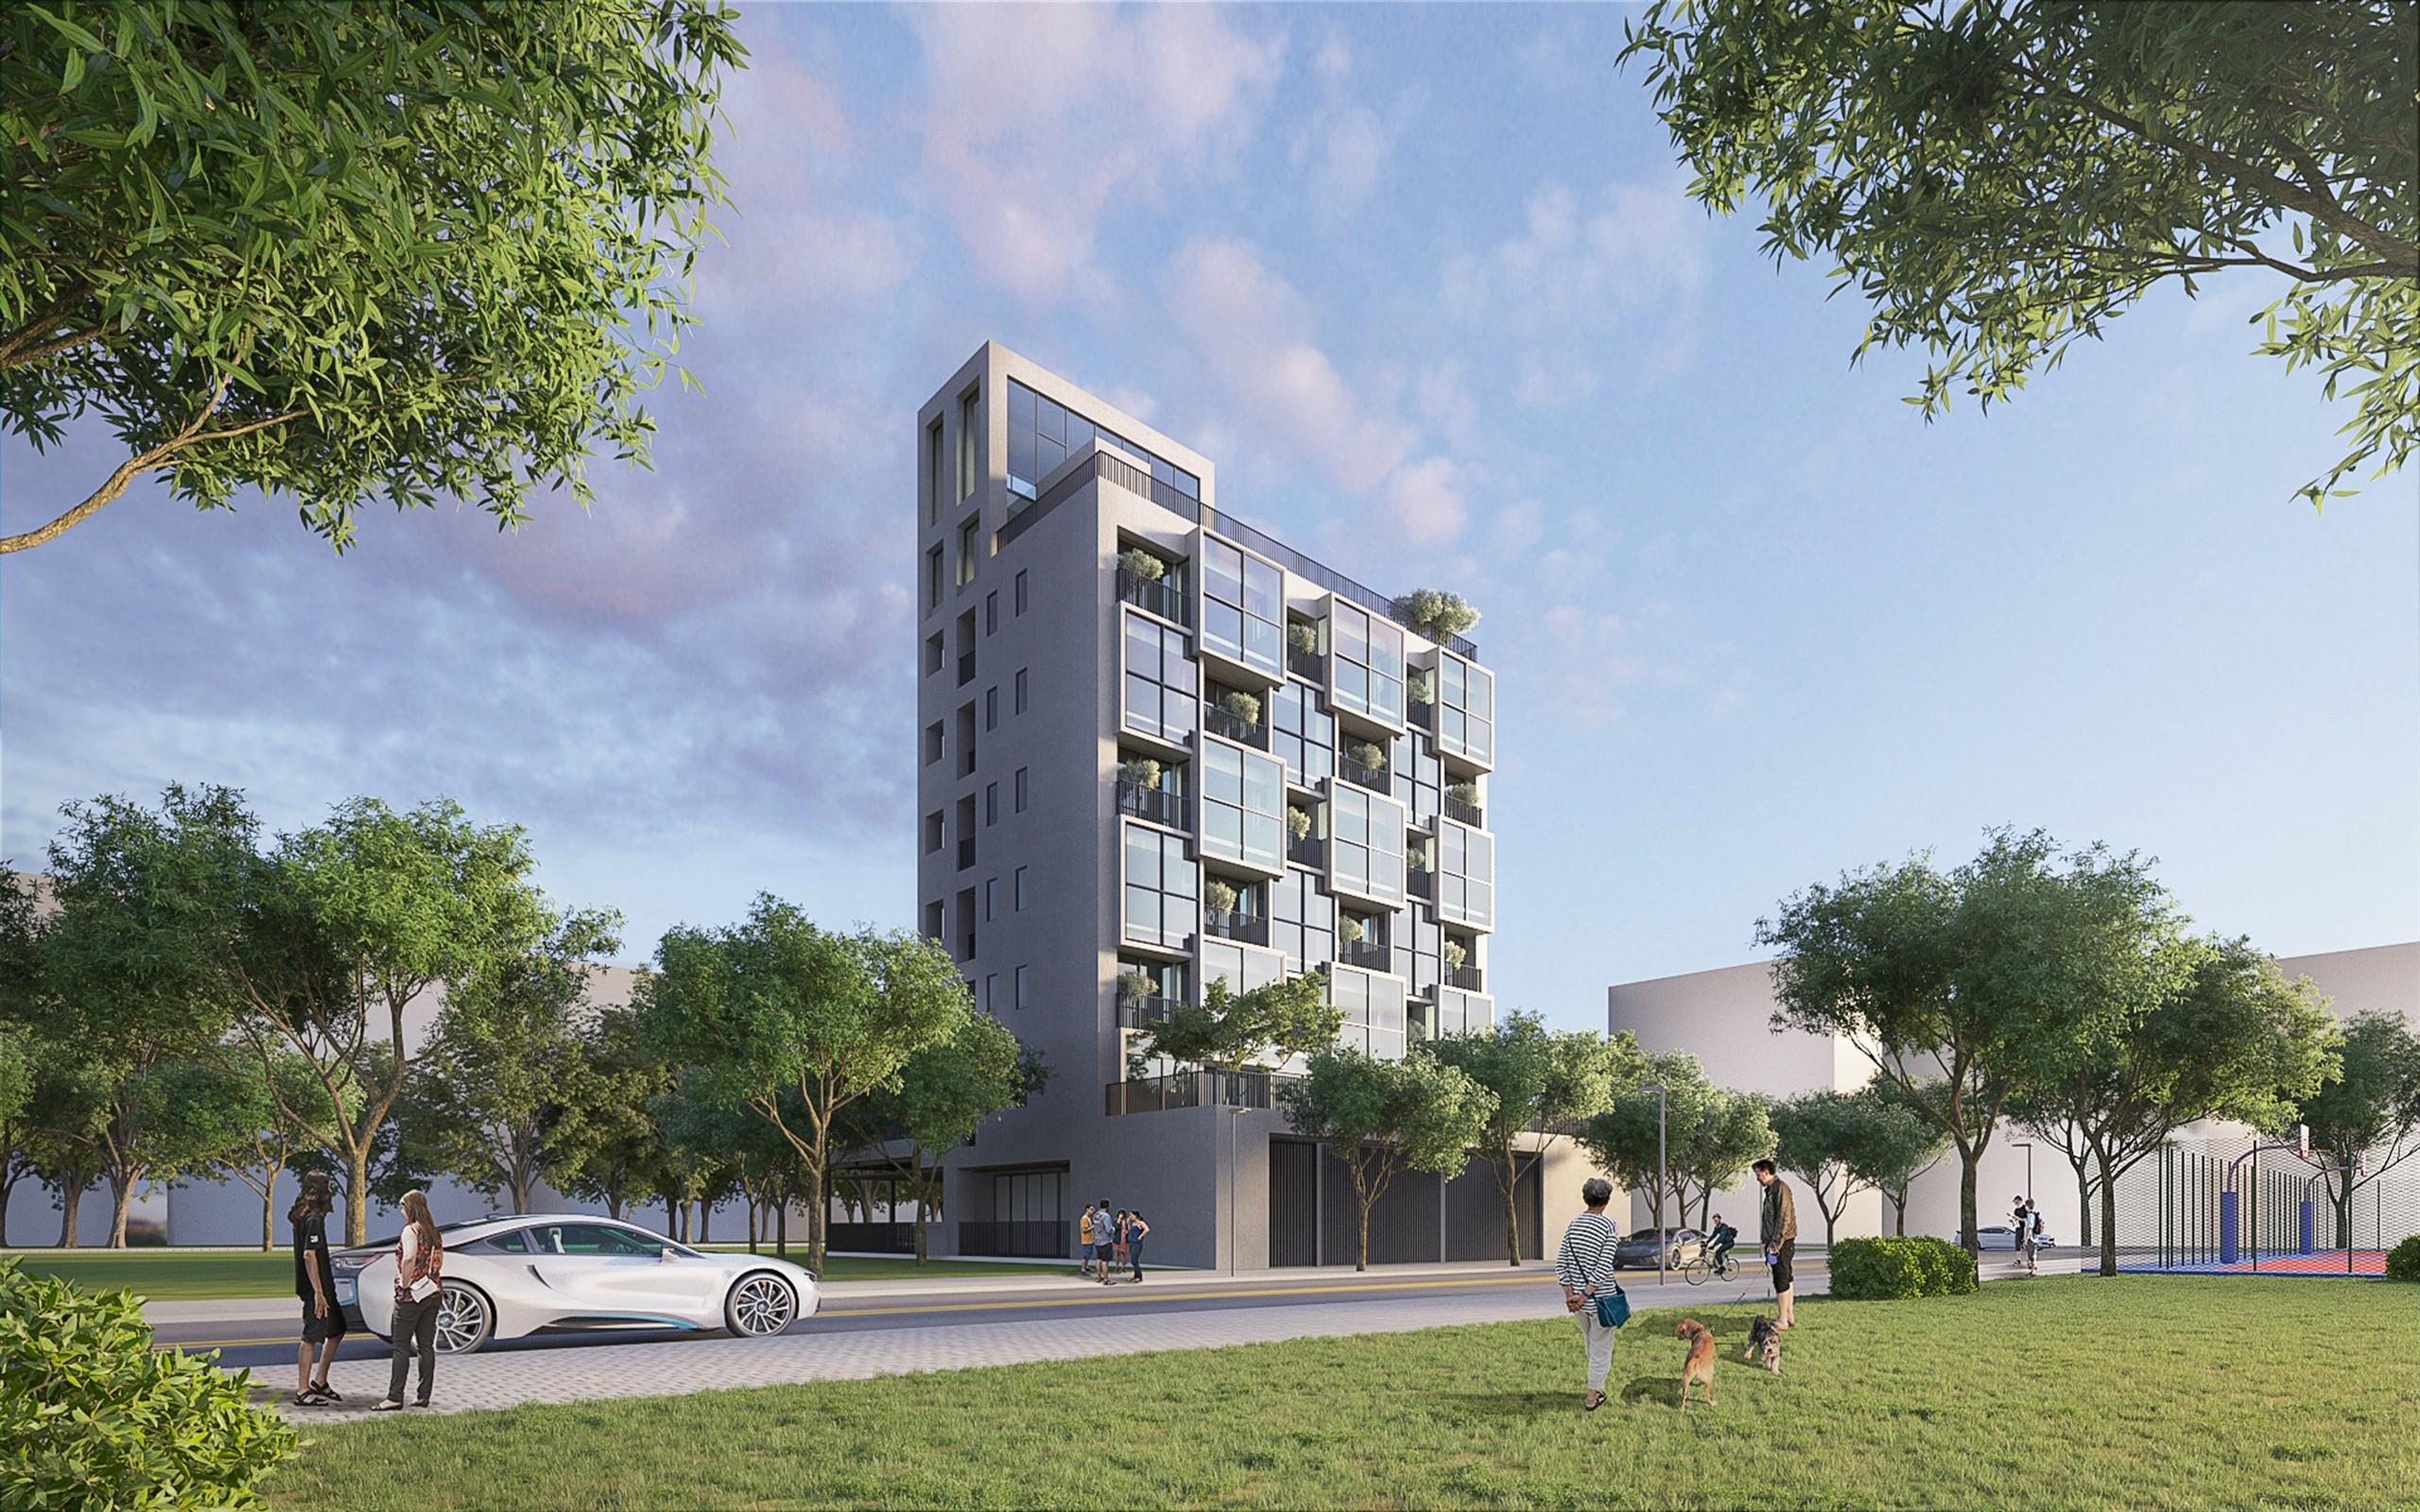 德築-DEZU-project-林口十現-architecture-building-3Drendering-7